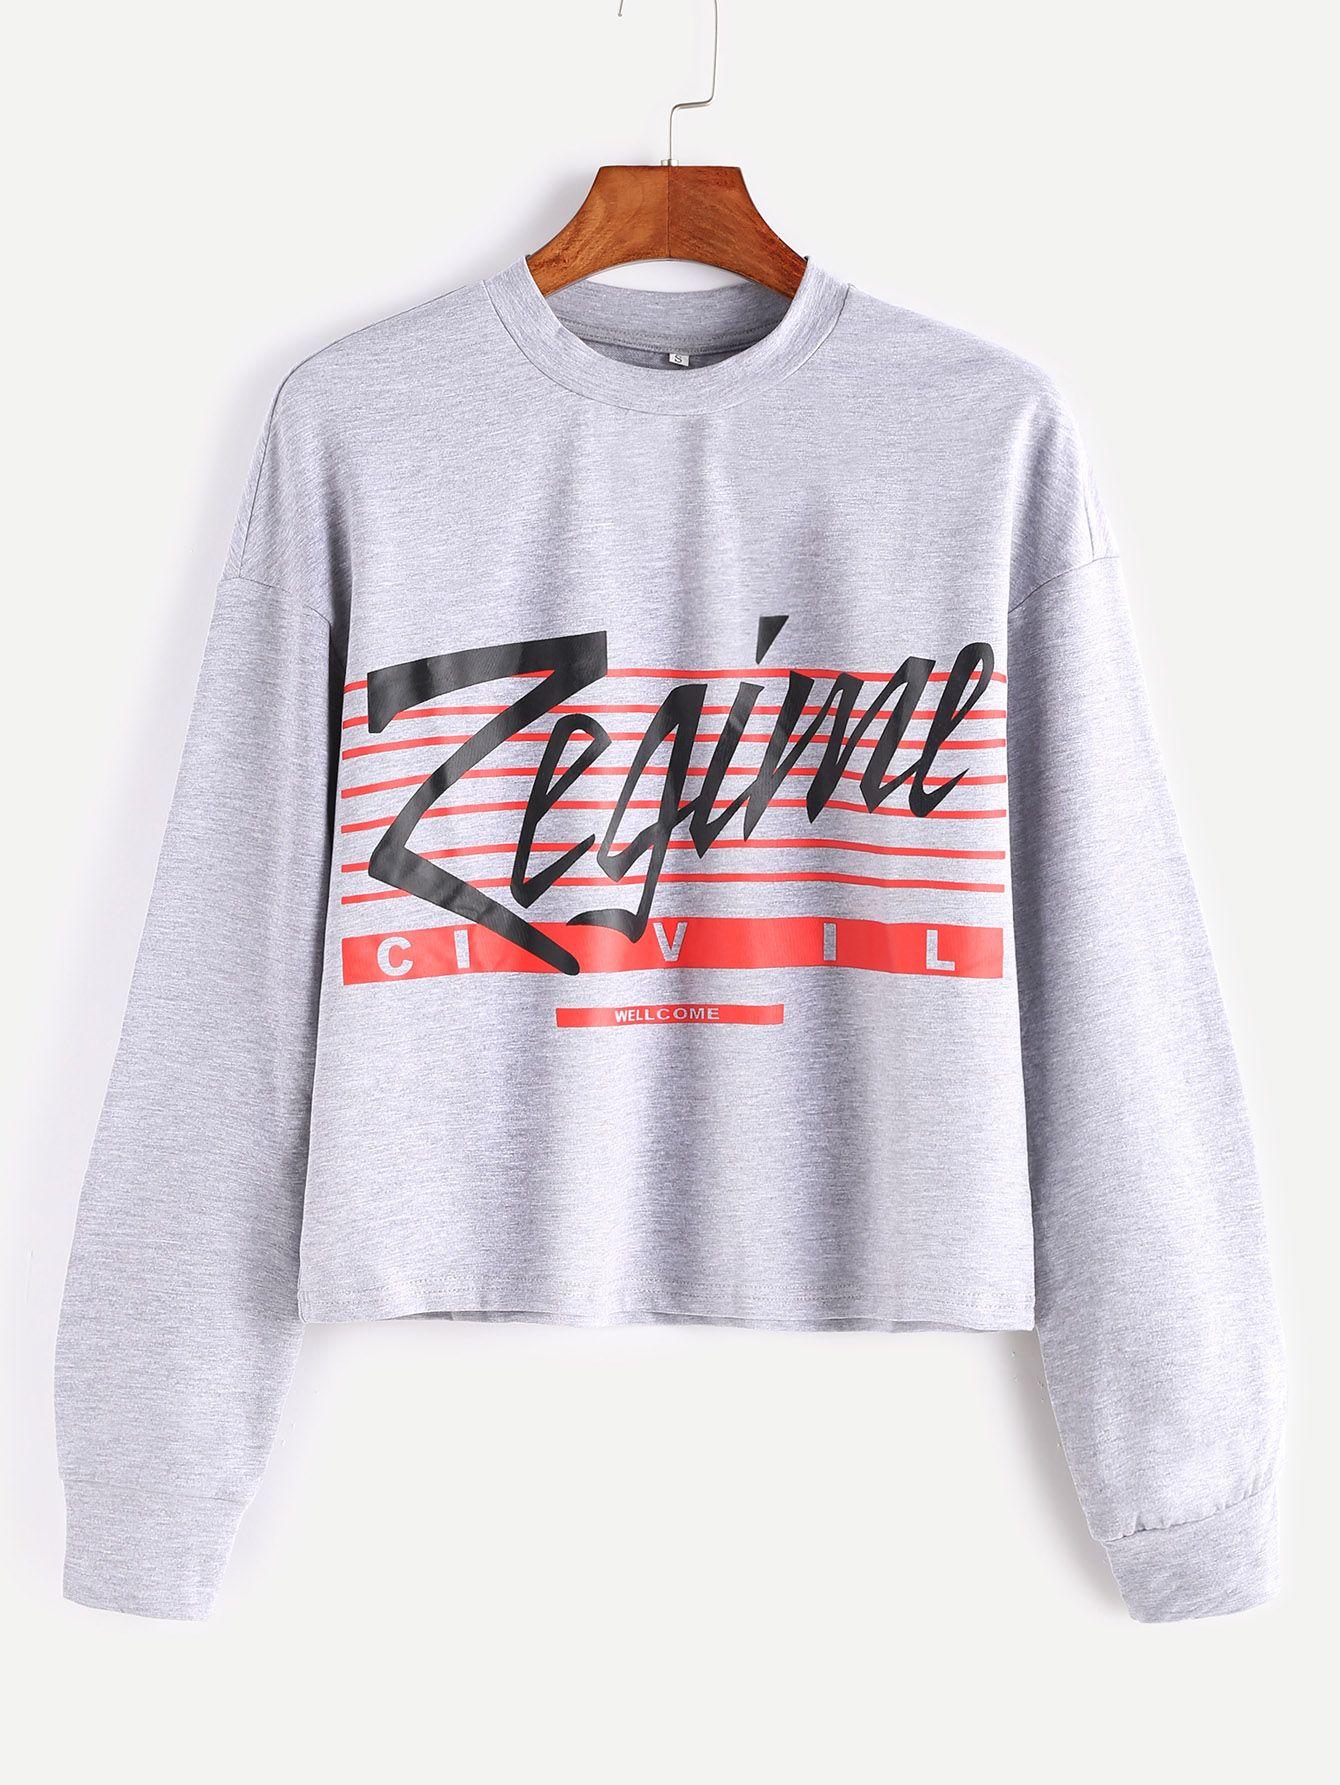 Heather Grey Letter Print Crop Sweatshirt — 0.00 € --------------color: Grey size: XS